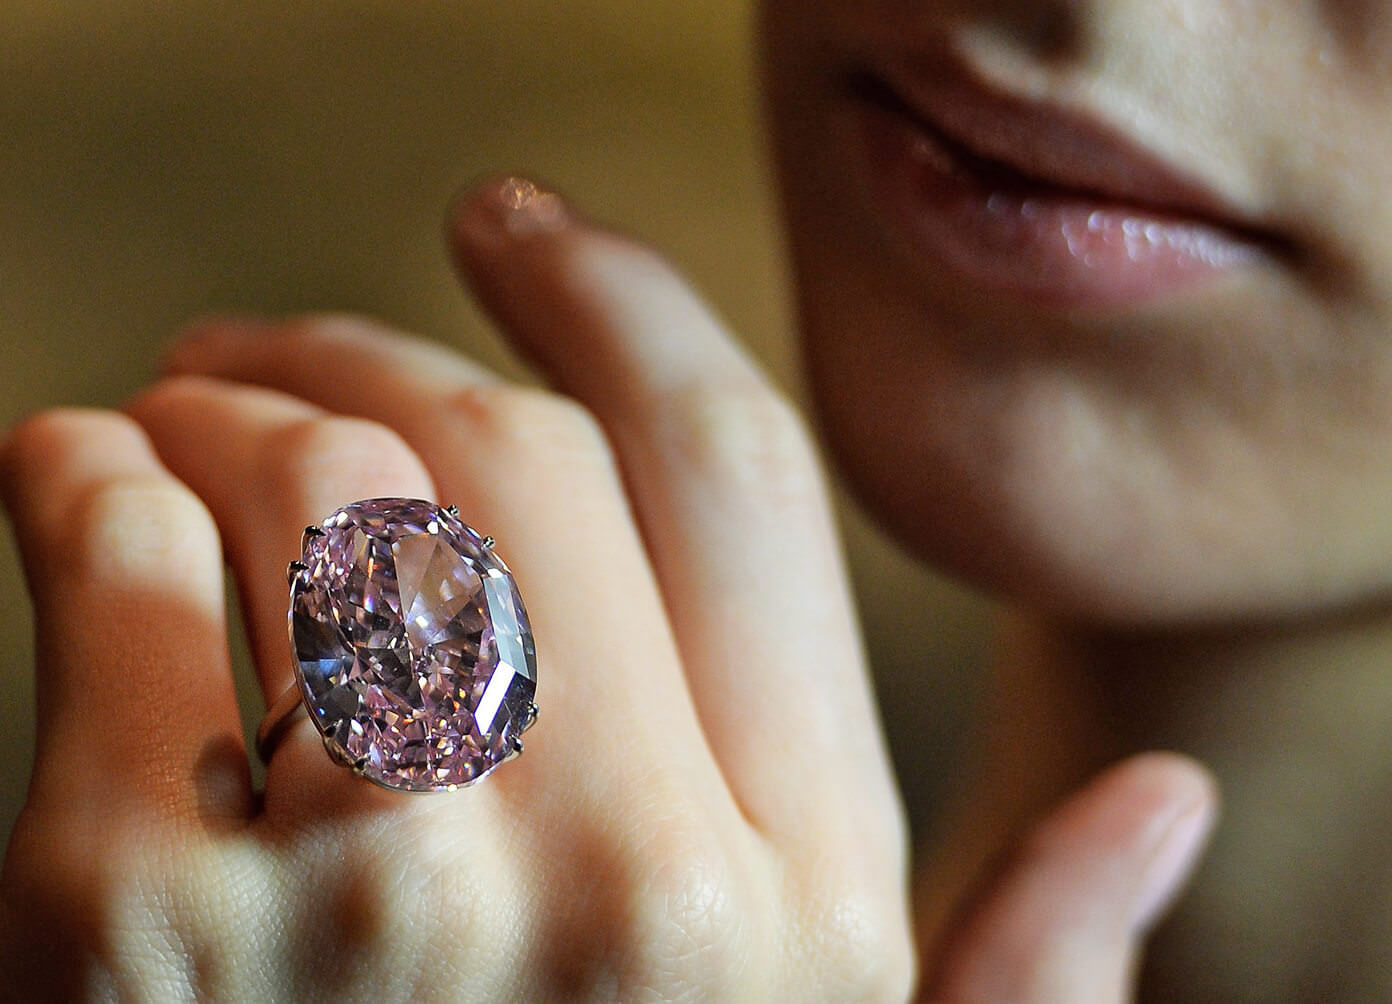 گرانترین جواهر الماس صورتی جهان ستاره صورتی